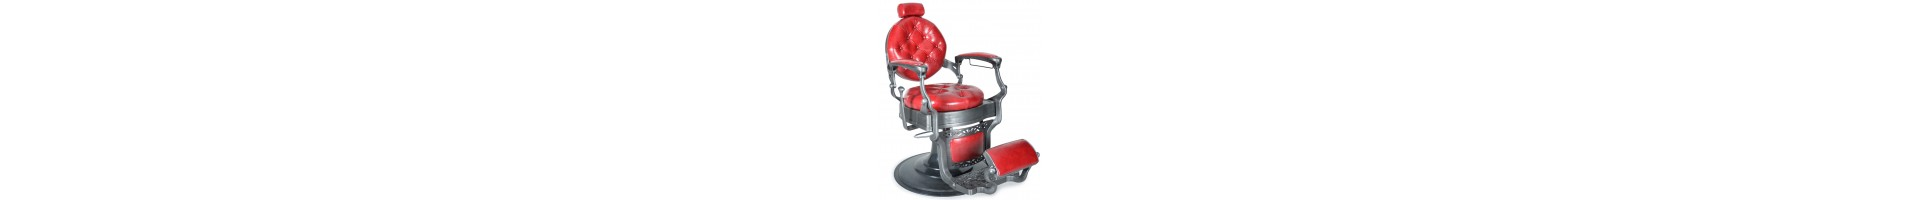 Comprar Mobiliario para Barbería Online - BeautyVip